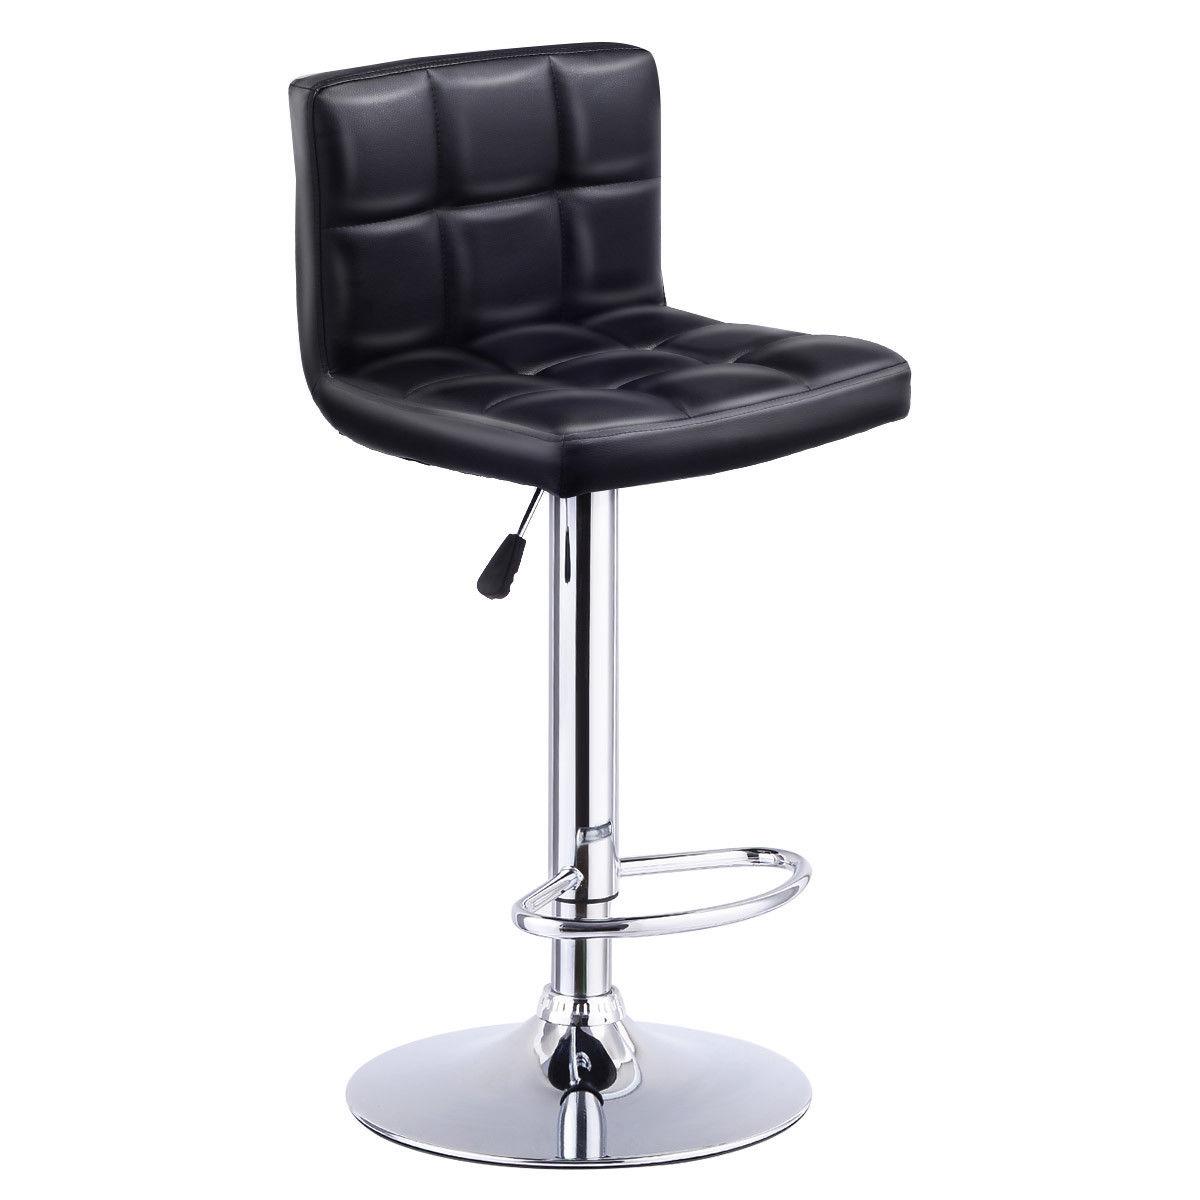 Costway 1 PC Bar Stool Swivel Adjustable PU Leather Bar Stools Bistro Pub Chair Black by Costway